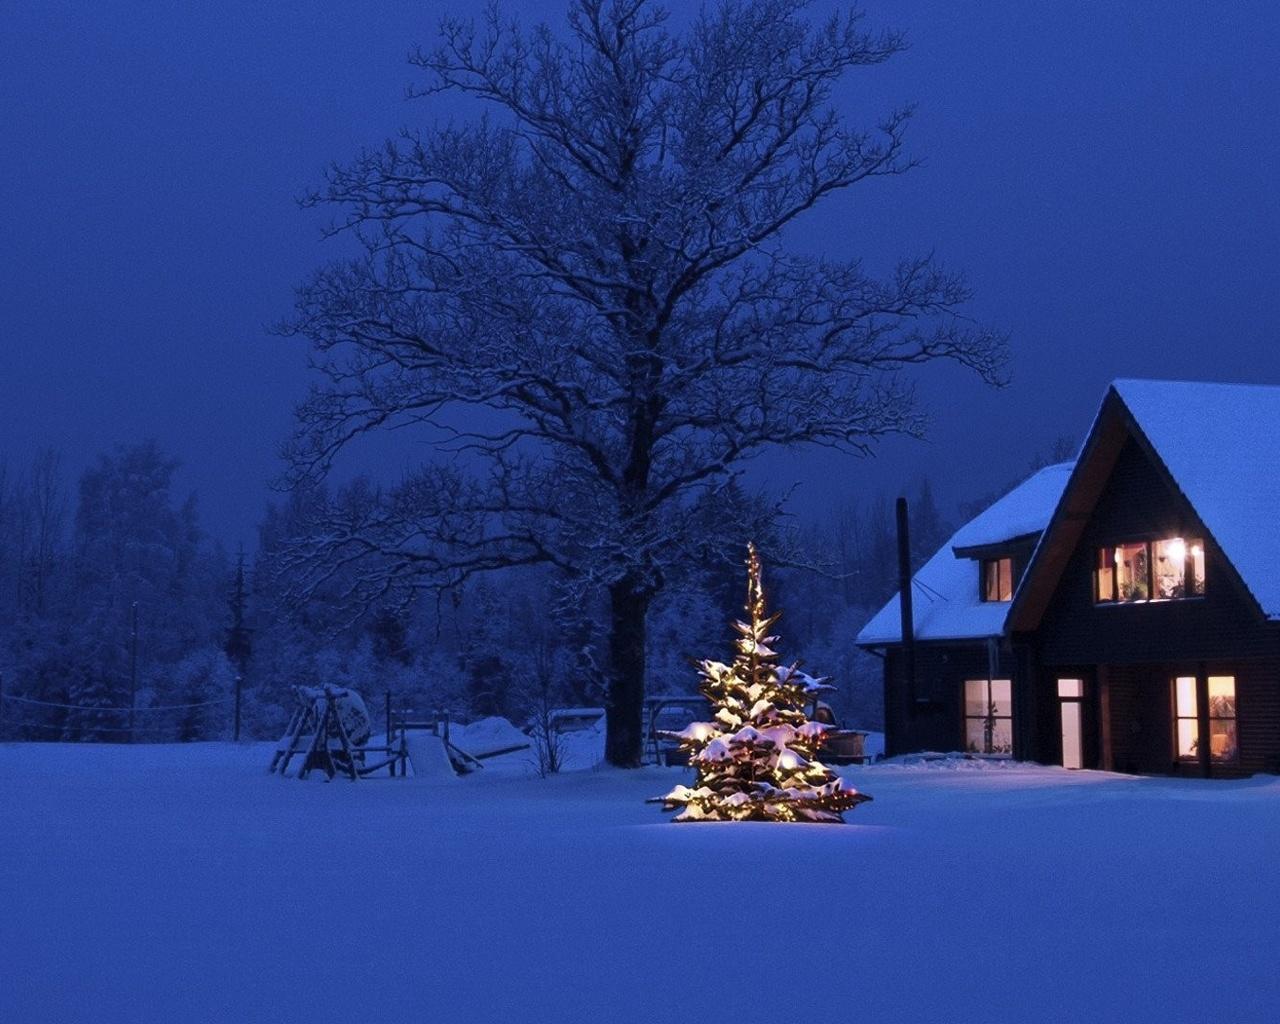 Зимние картинки с домиками и елками